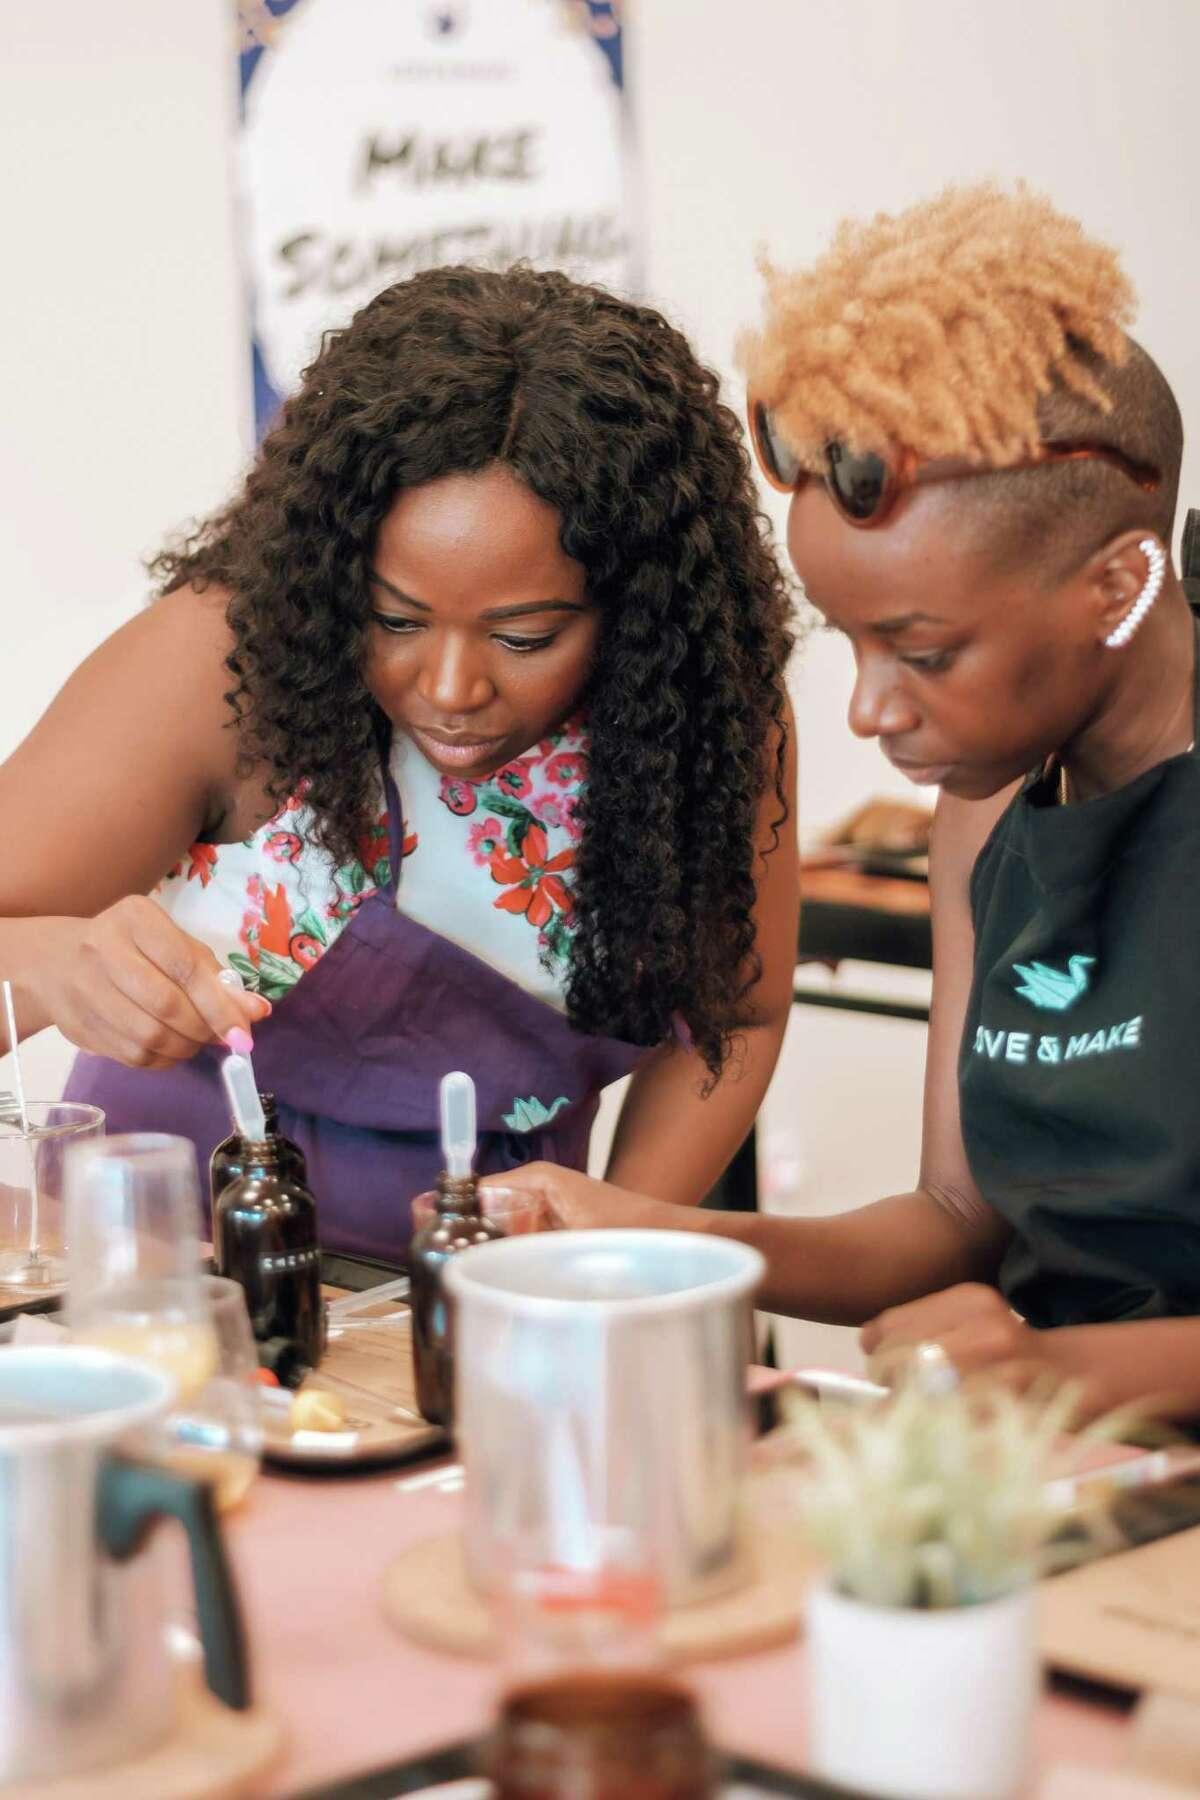 Love & Make founders Bukola Aigbedion, left, and Amara Aigbedion